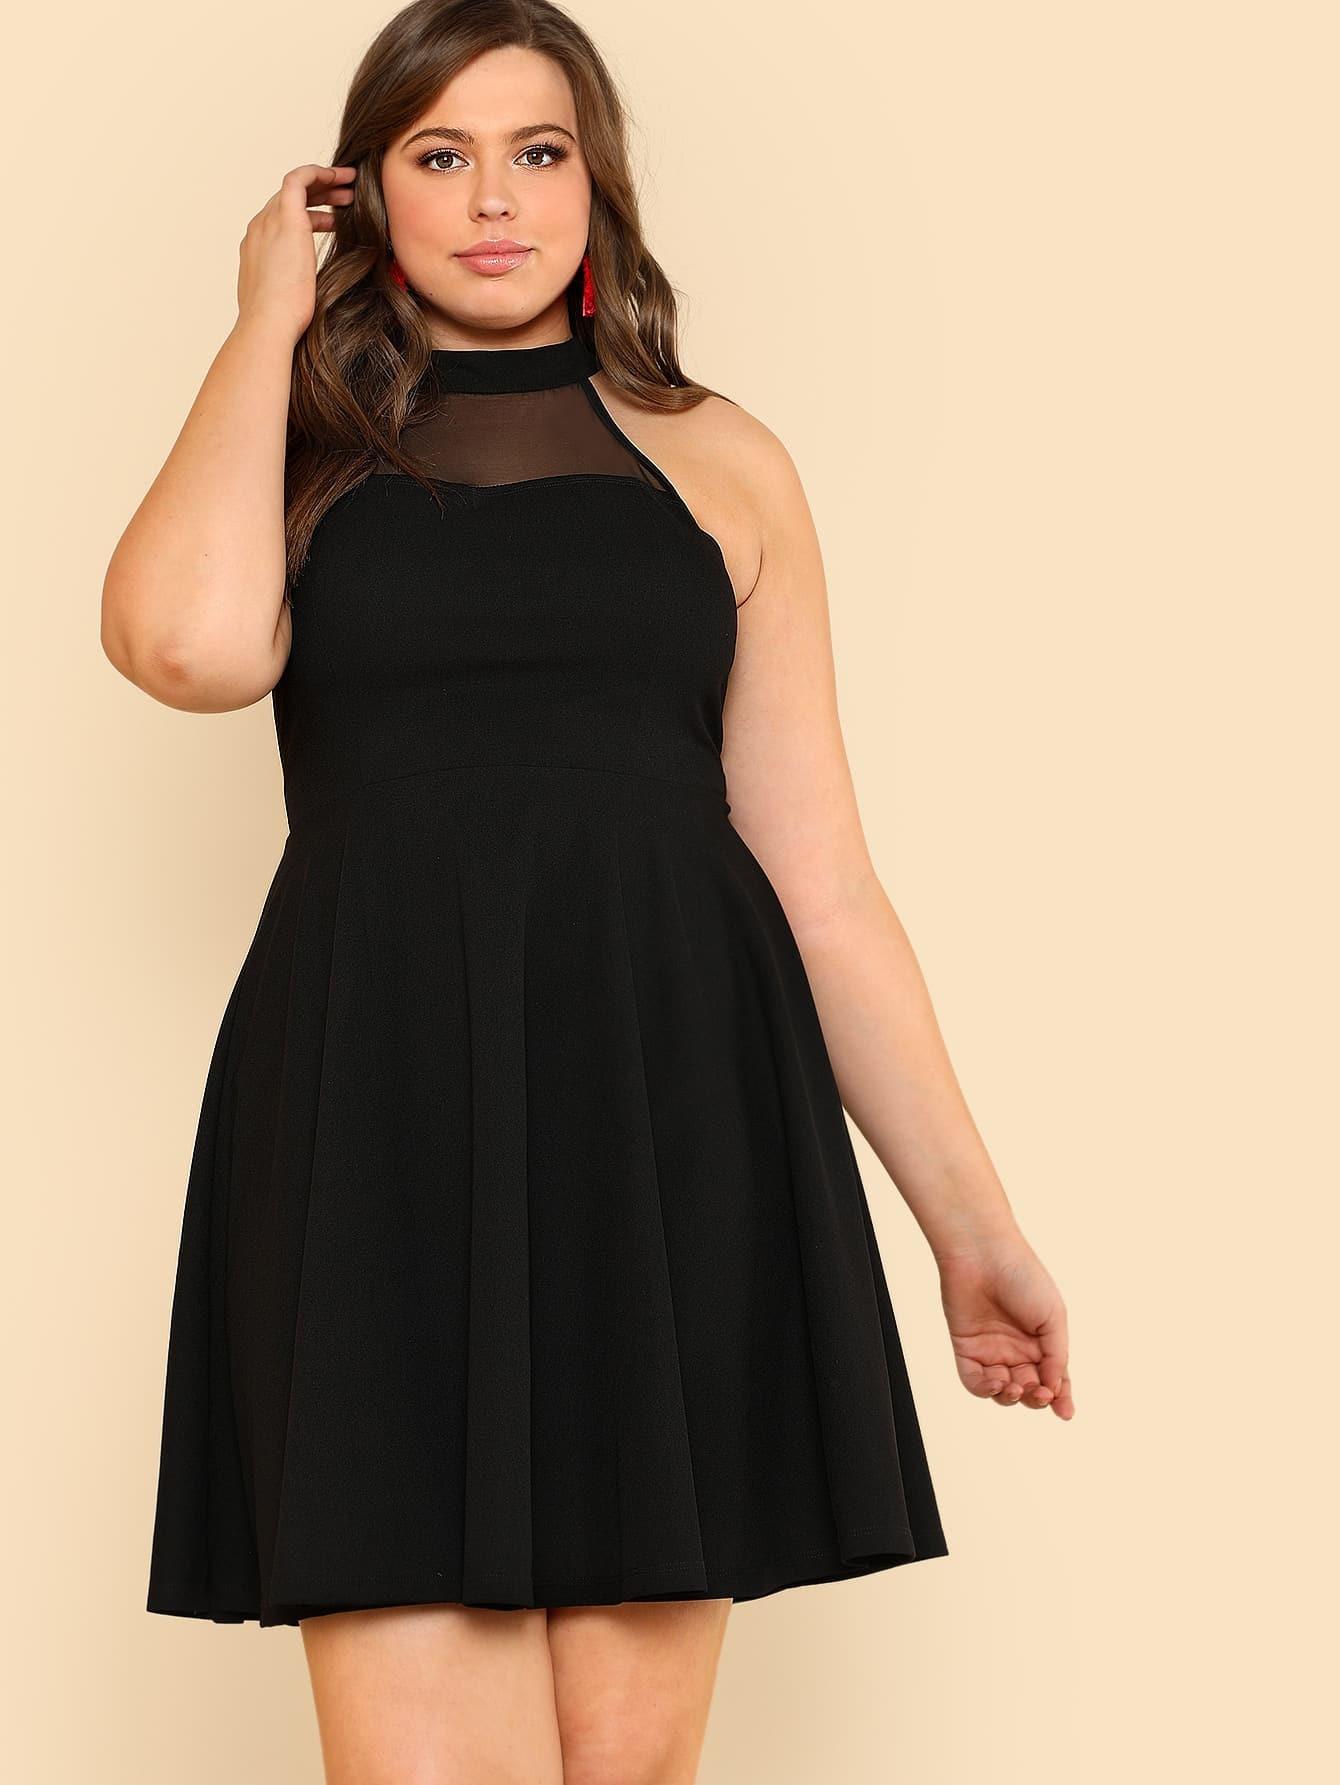 Open Back Mesh Insert Halter Dress open back lace insert night dress